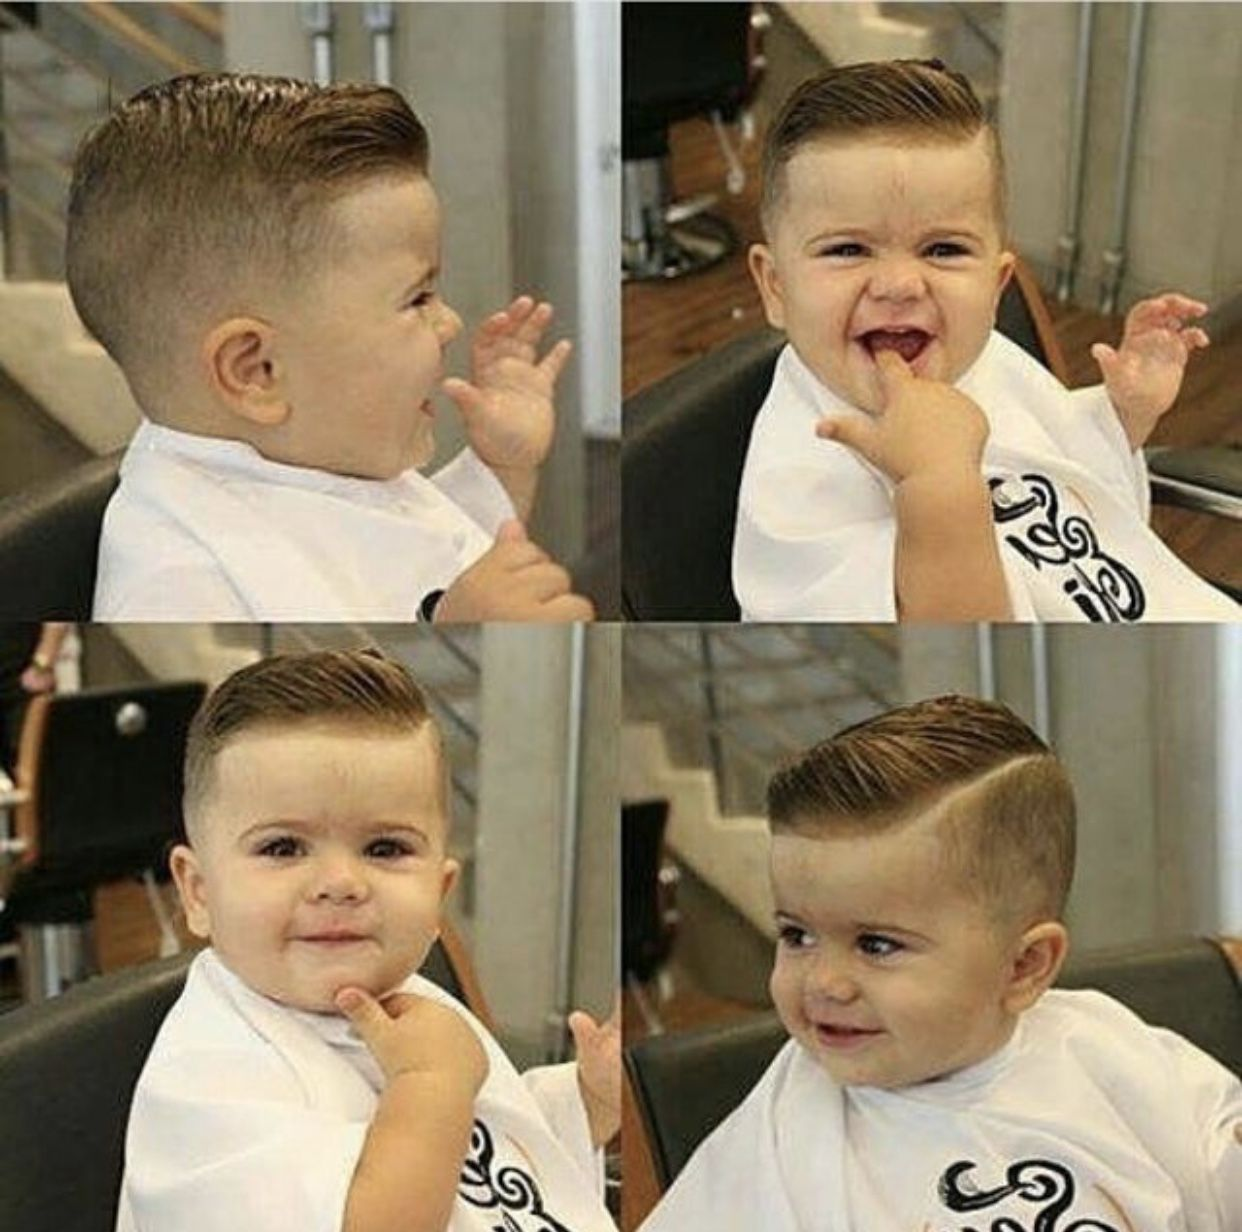 Pin By Adelina Adriana On Hair Pinterest Haircuts Boy Hair And